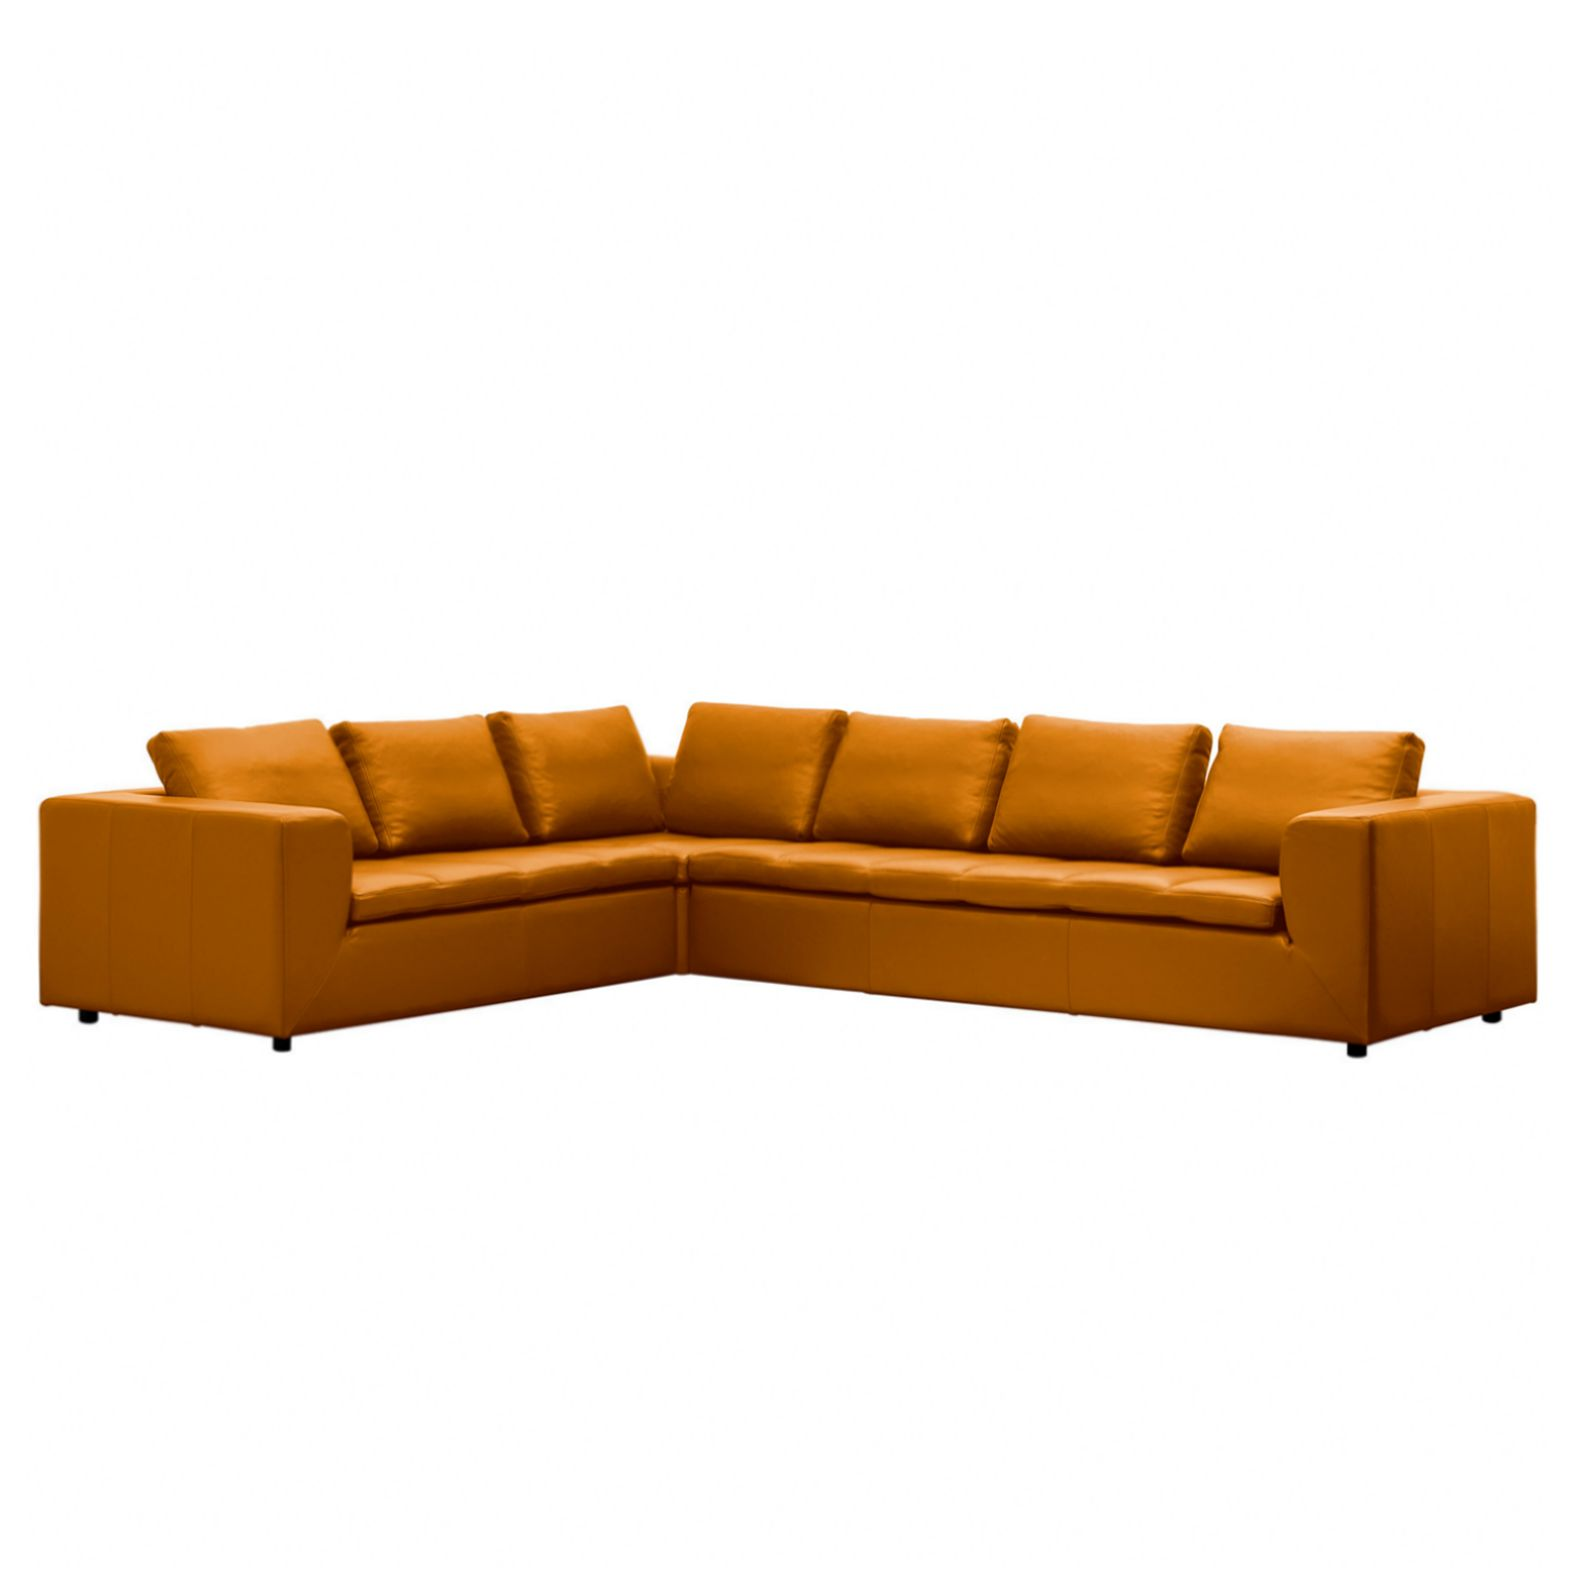 Ecksofa Brooklyn Echtleder - 2-Sitzer davorstehend links - Echtleder Neka Cognac